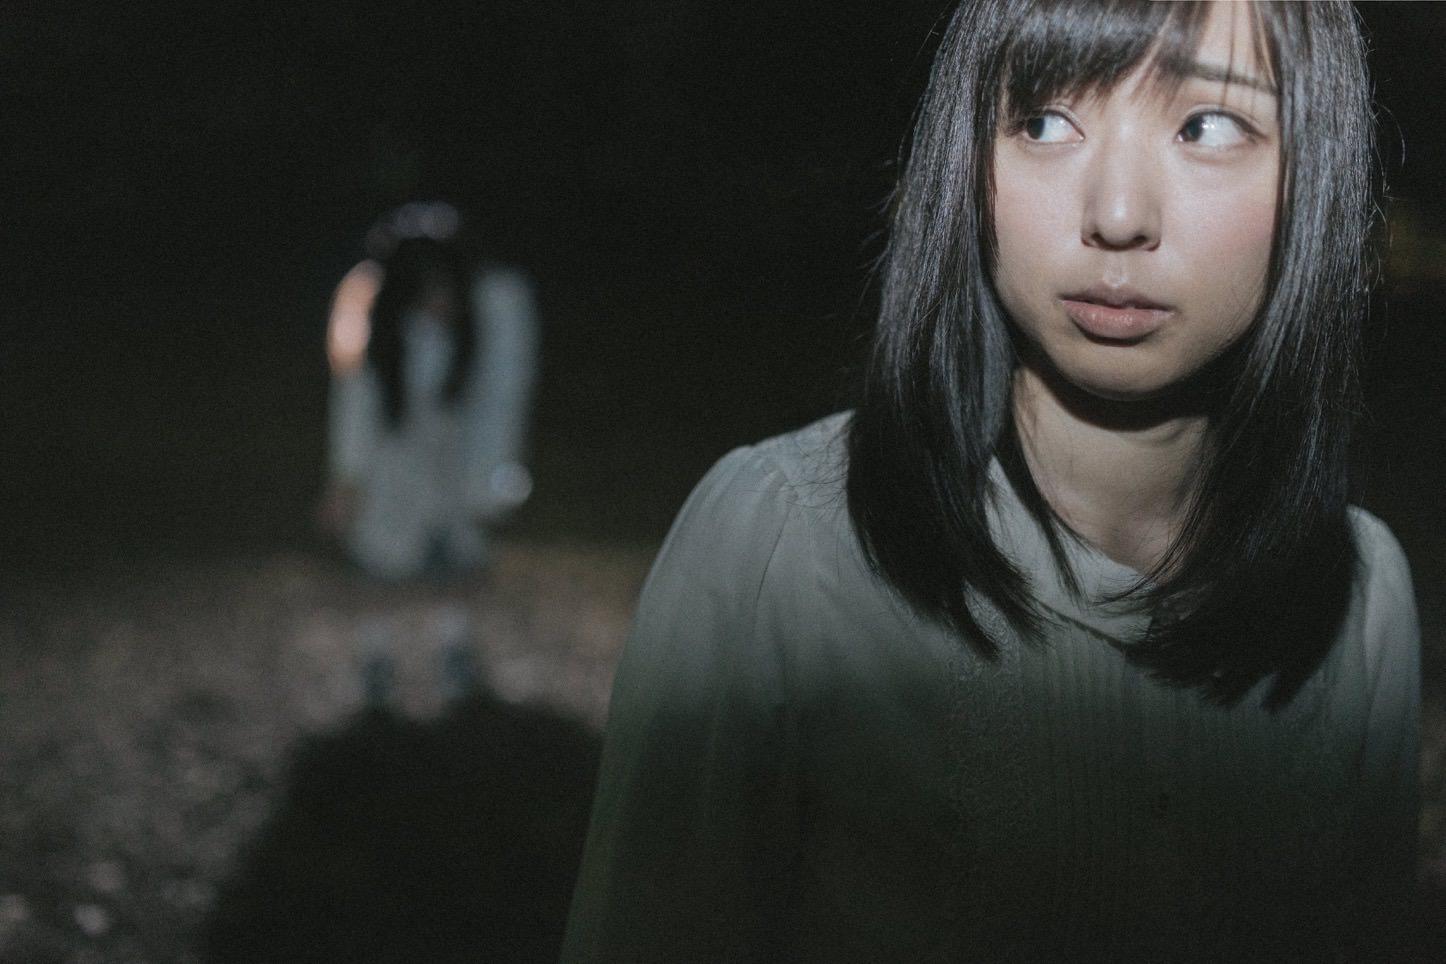 Pakutaso-Horror-Free-Stock-Photos-74.jpg